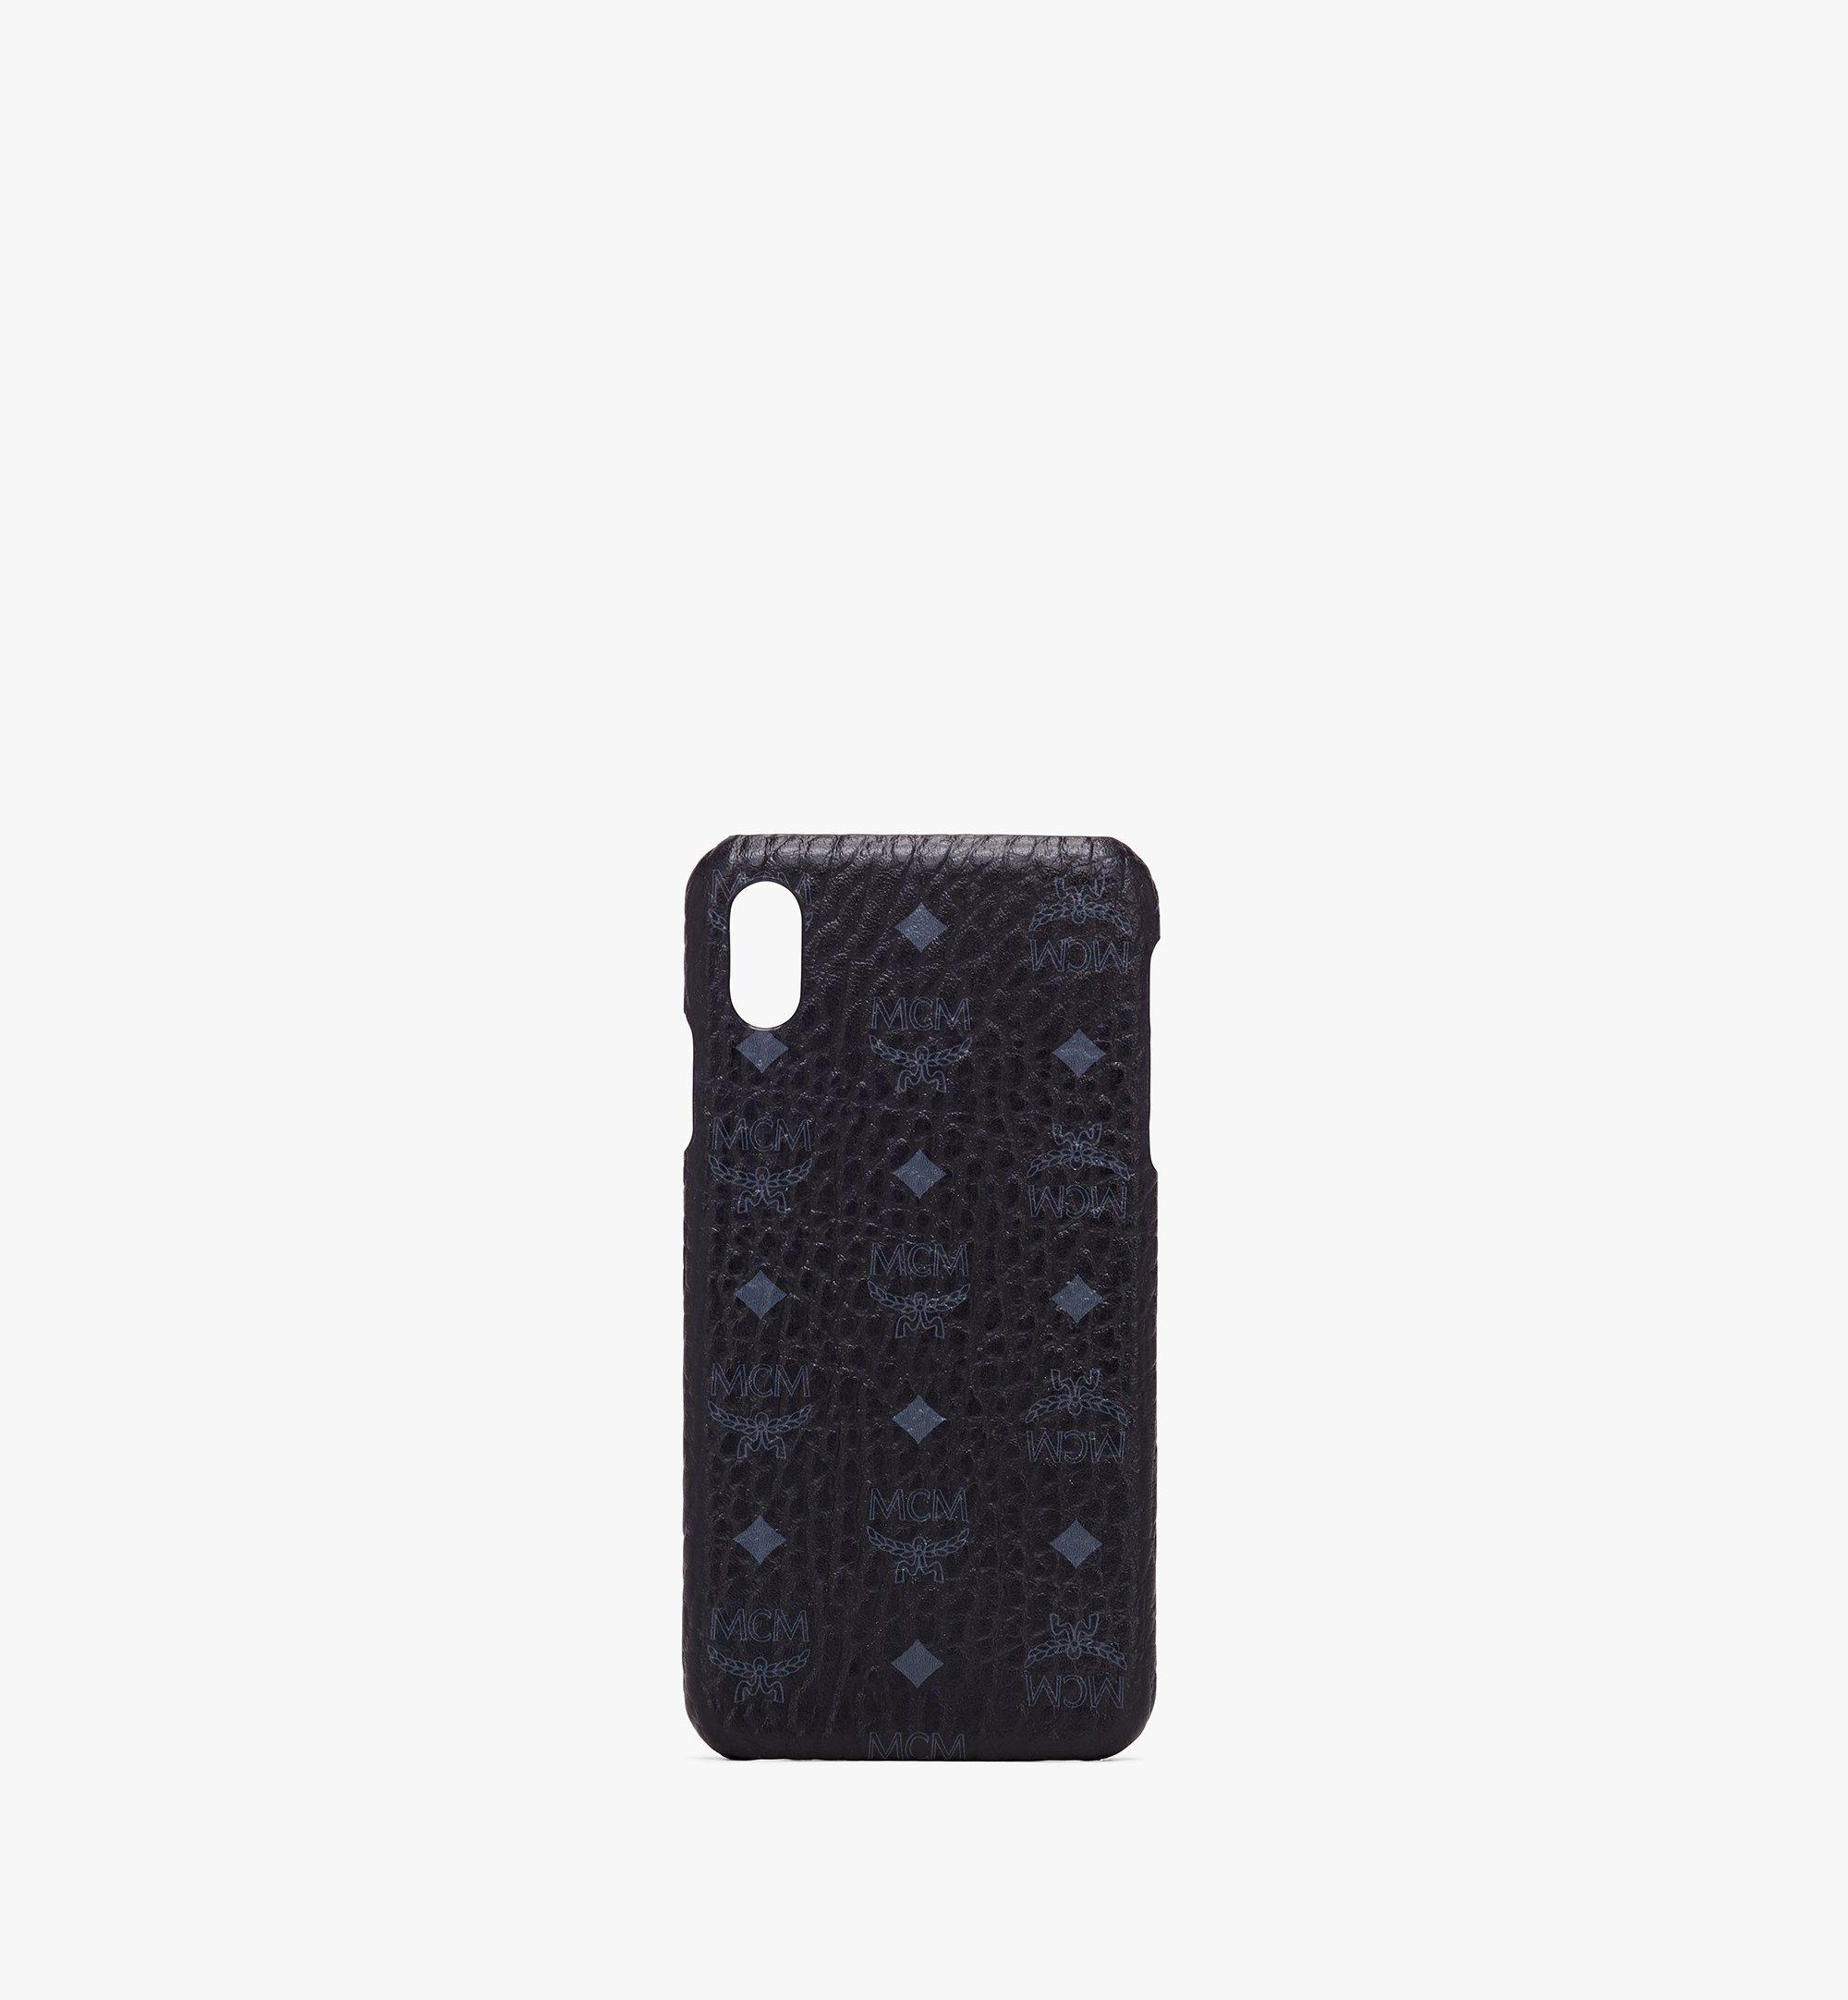 MCM ヴィセトス iPhone XS Max ケース Black MZE9AVI98BK001 Alternate View 1